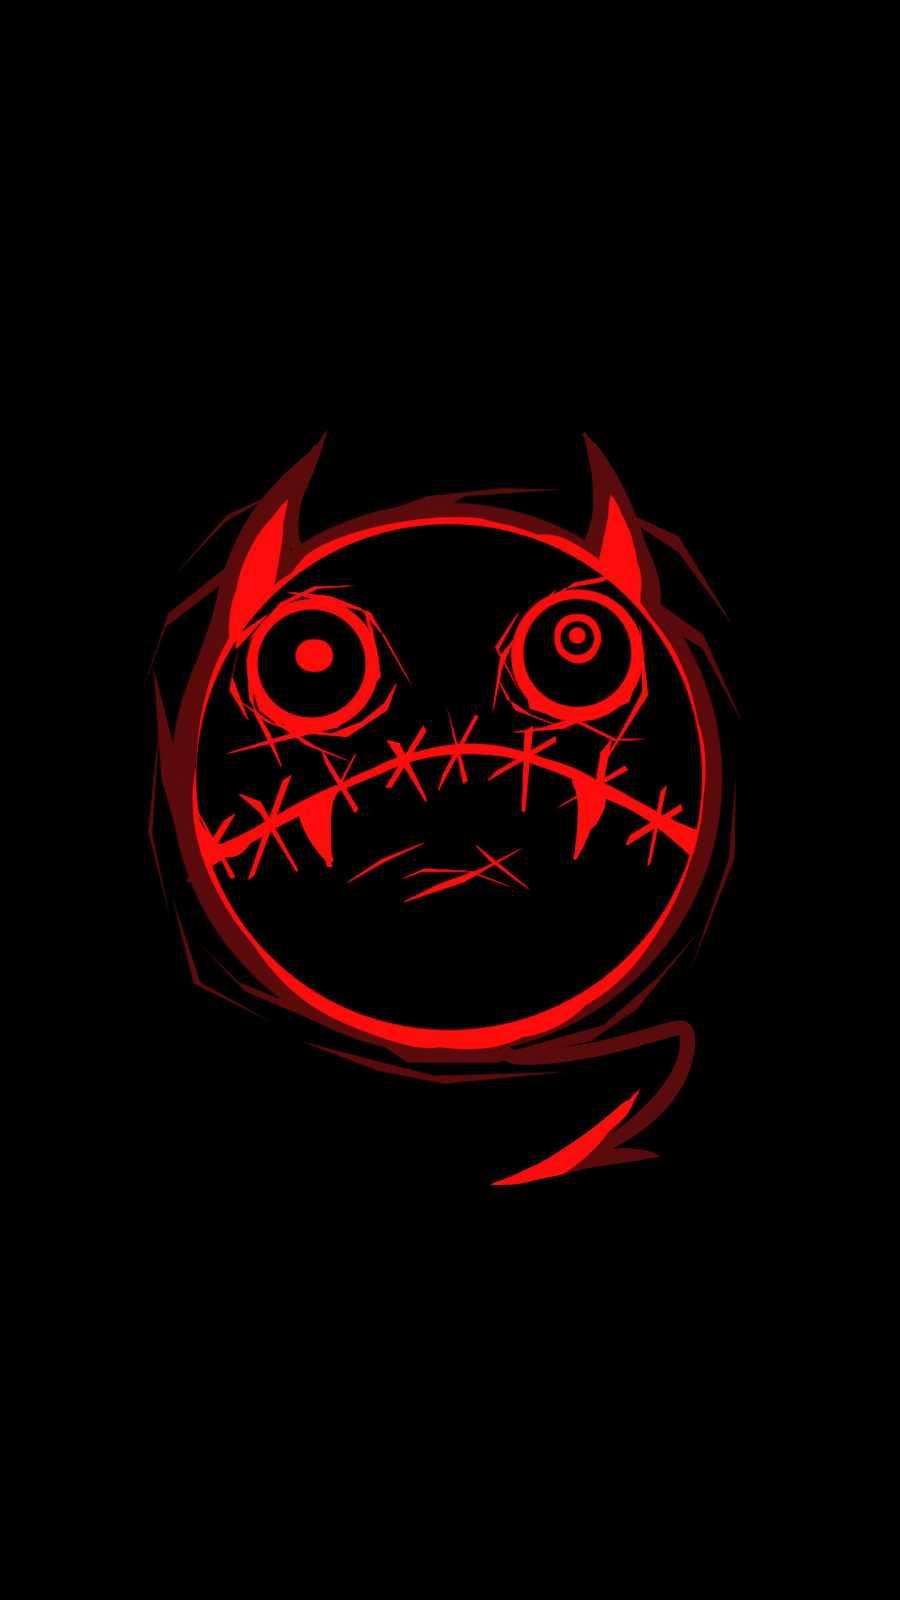 Monster Face iPhone Wallpaper